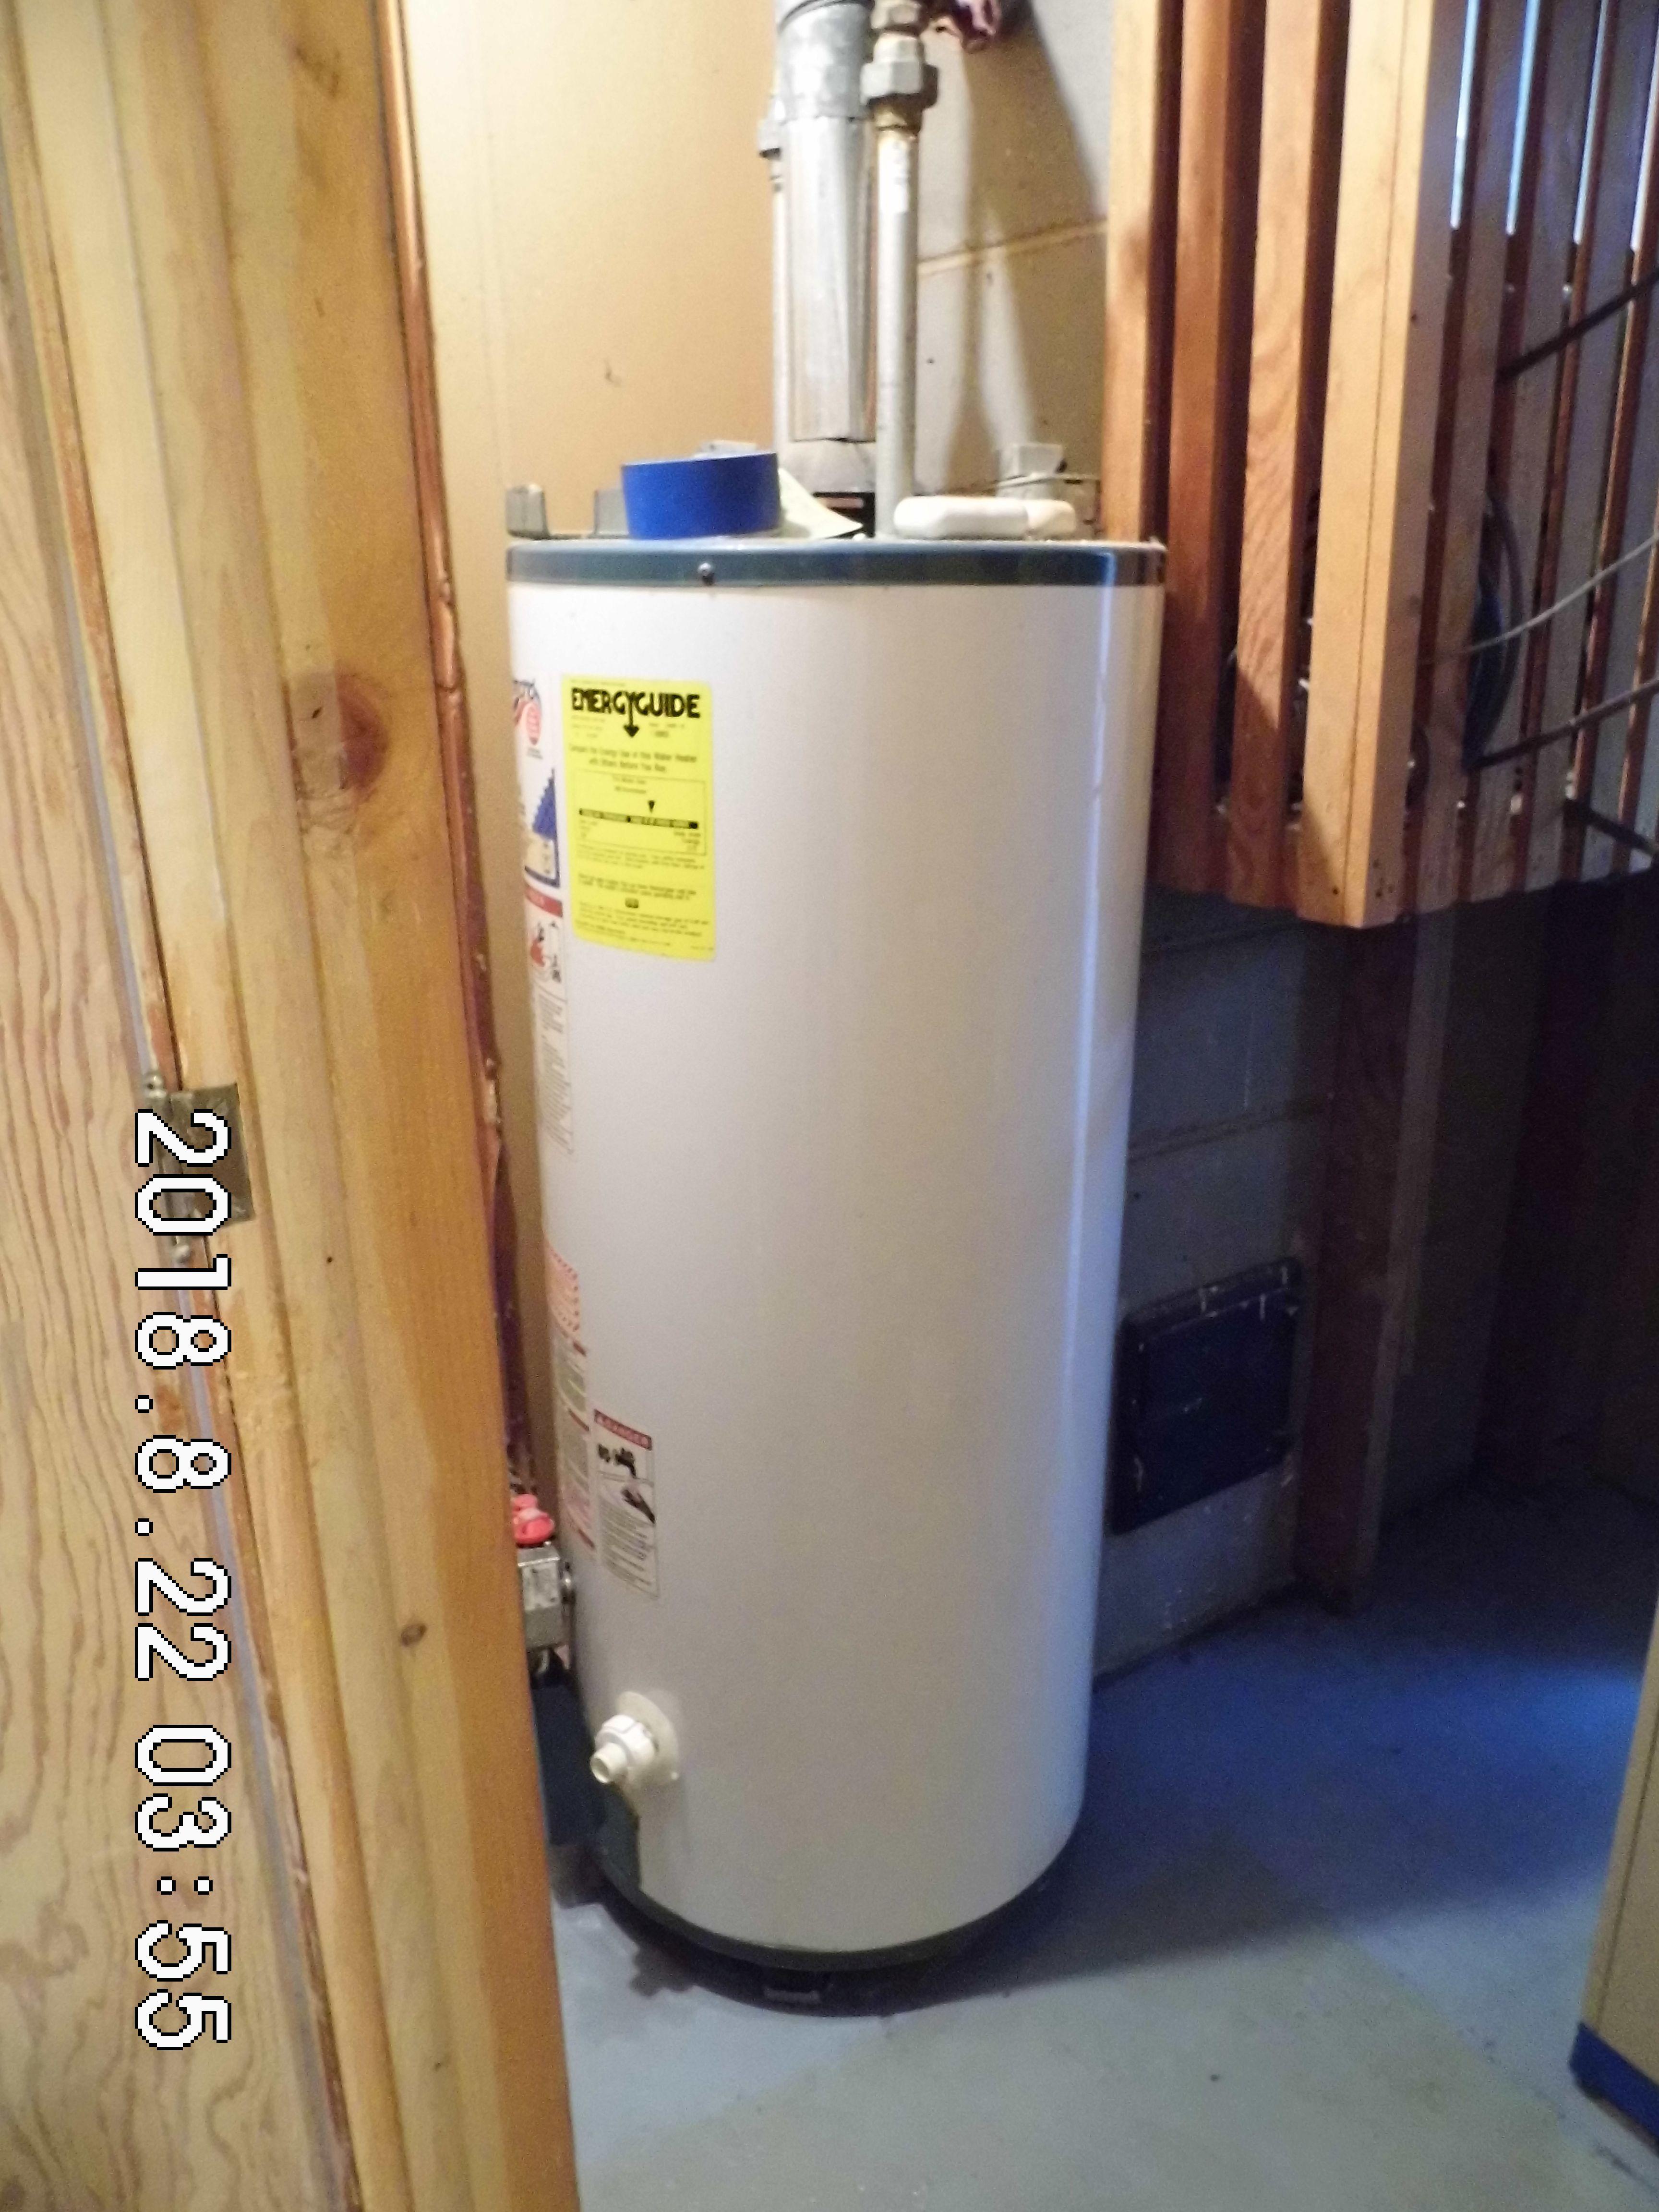 3.4 303 Elm St. 40gal Water Heater